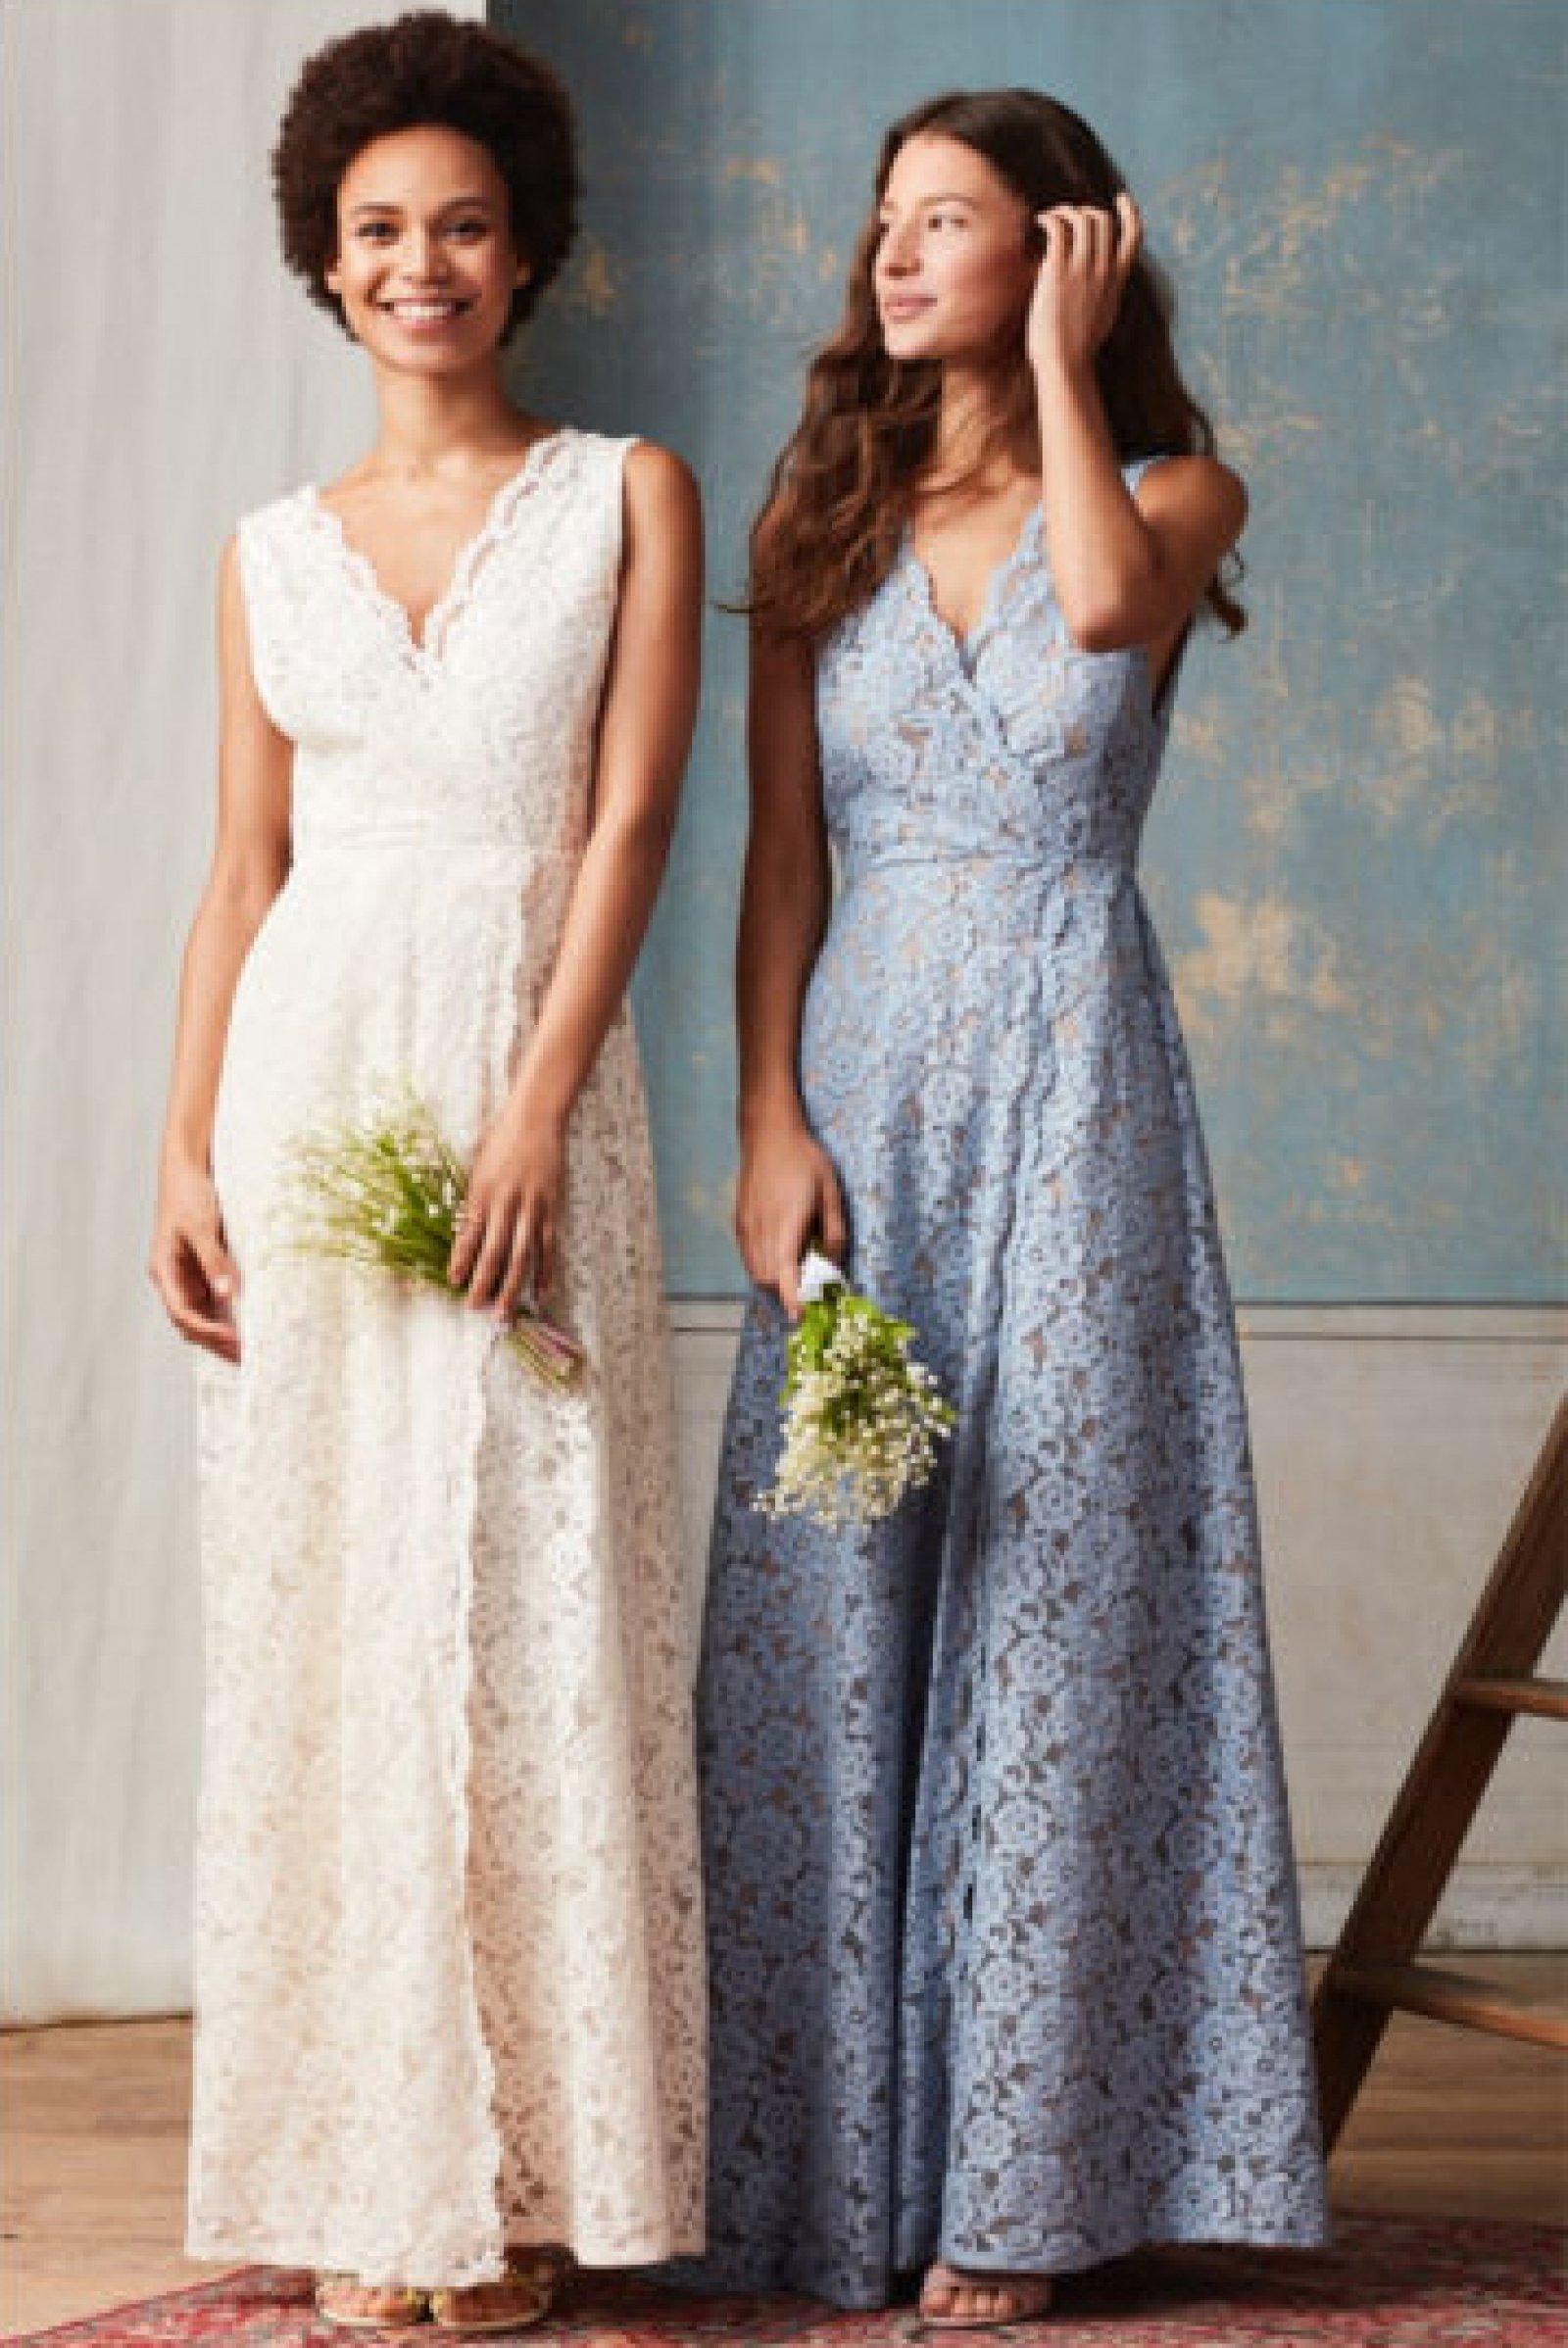 Imagen de campaña de 'The Wedding Shop' de H&M.